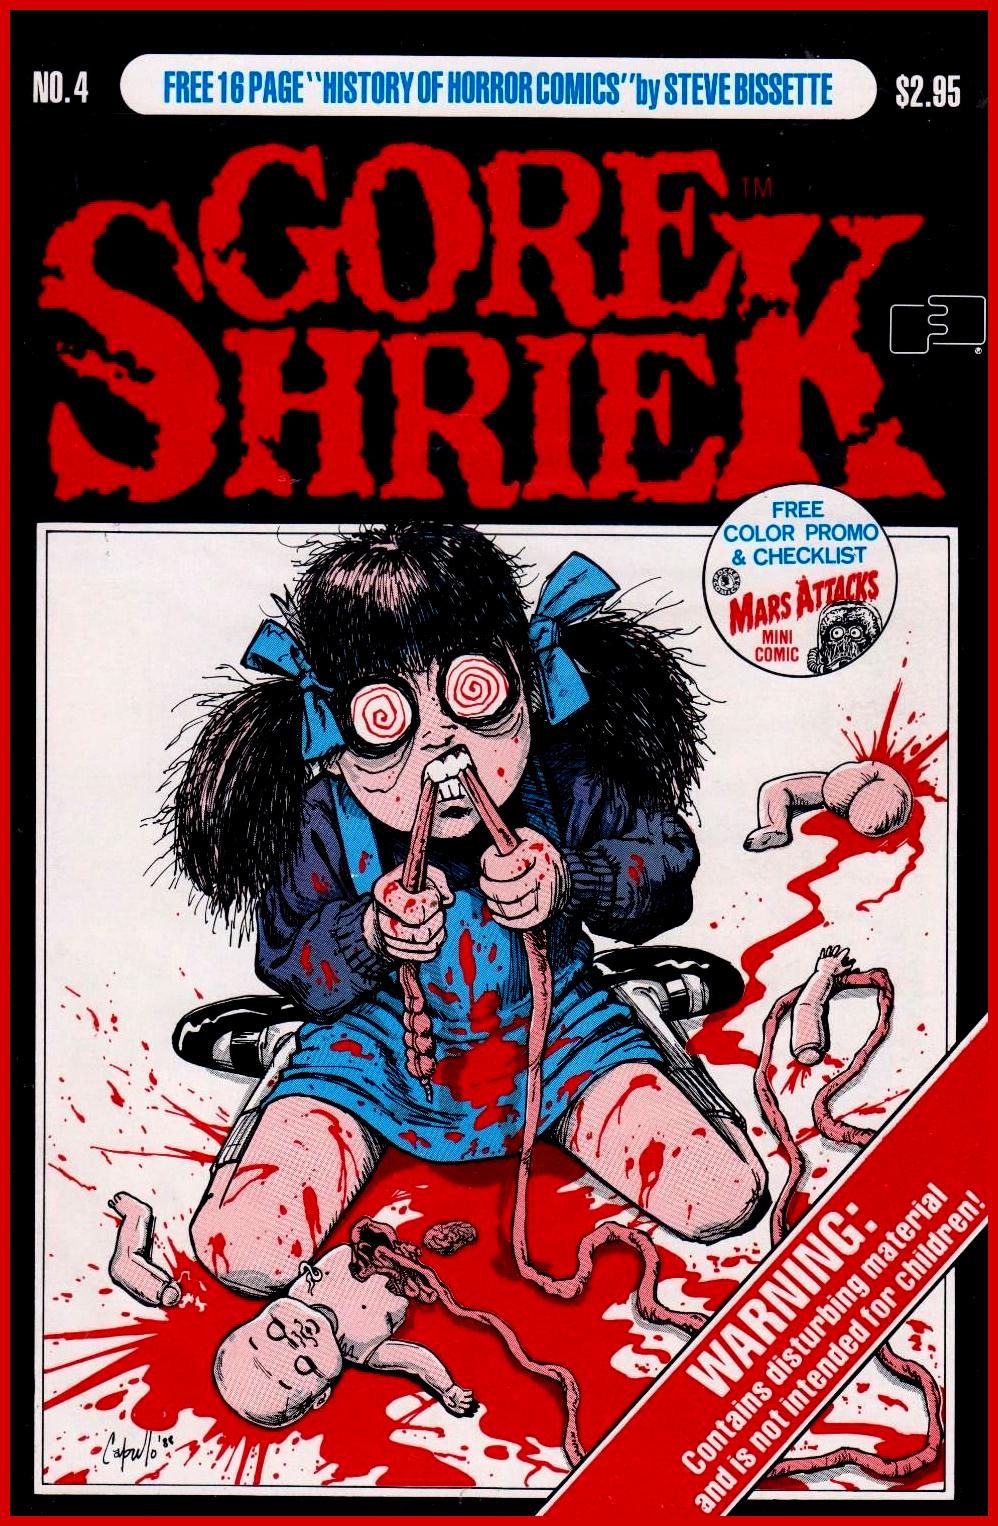 GORE SHRIEK Vol. 1 #4 52PP RELEASED 1988.